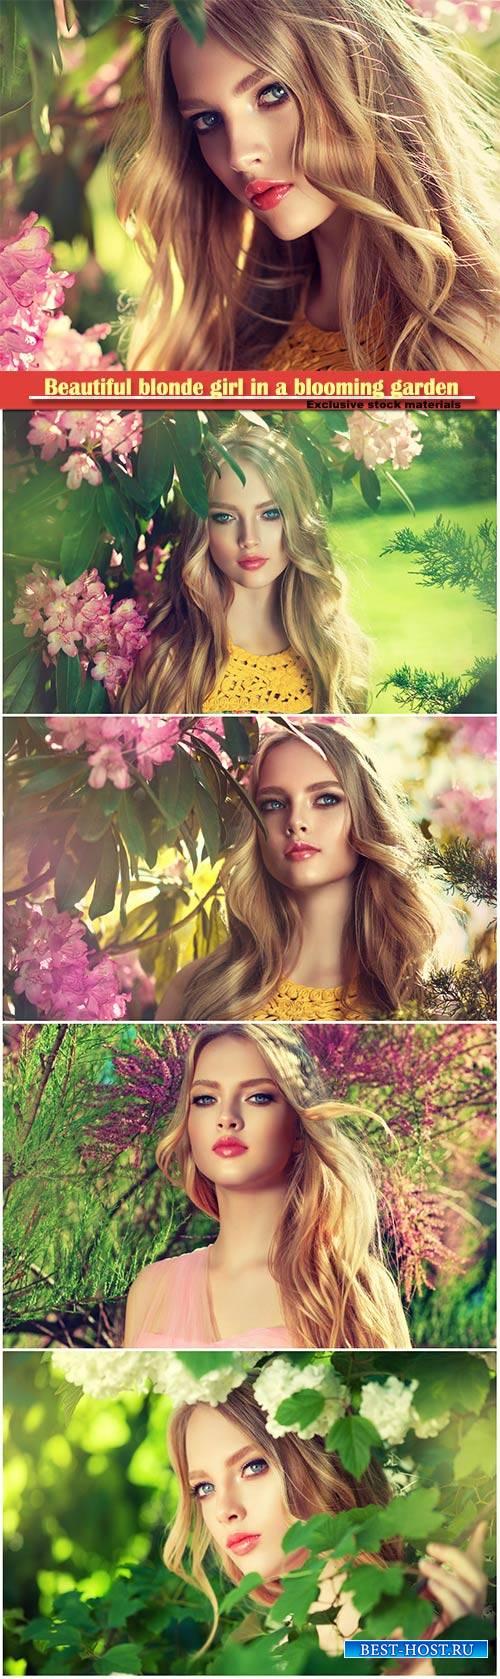 Beautiful blonde girl in a blooming garden